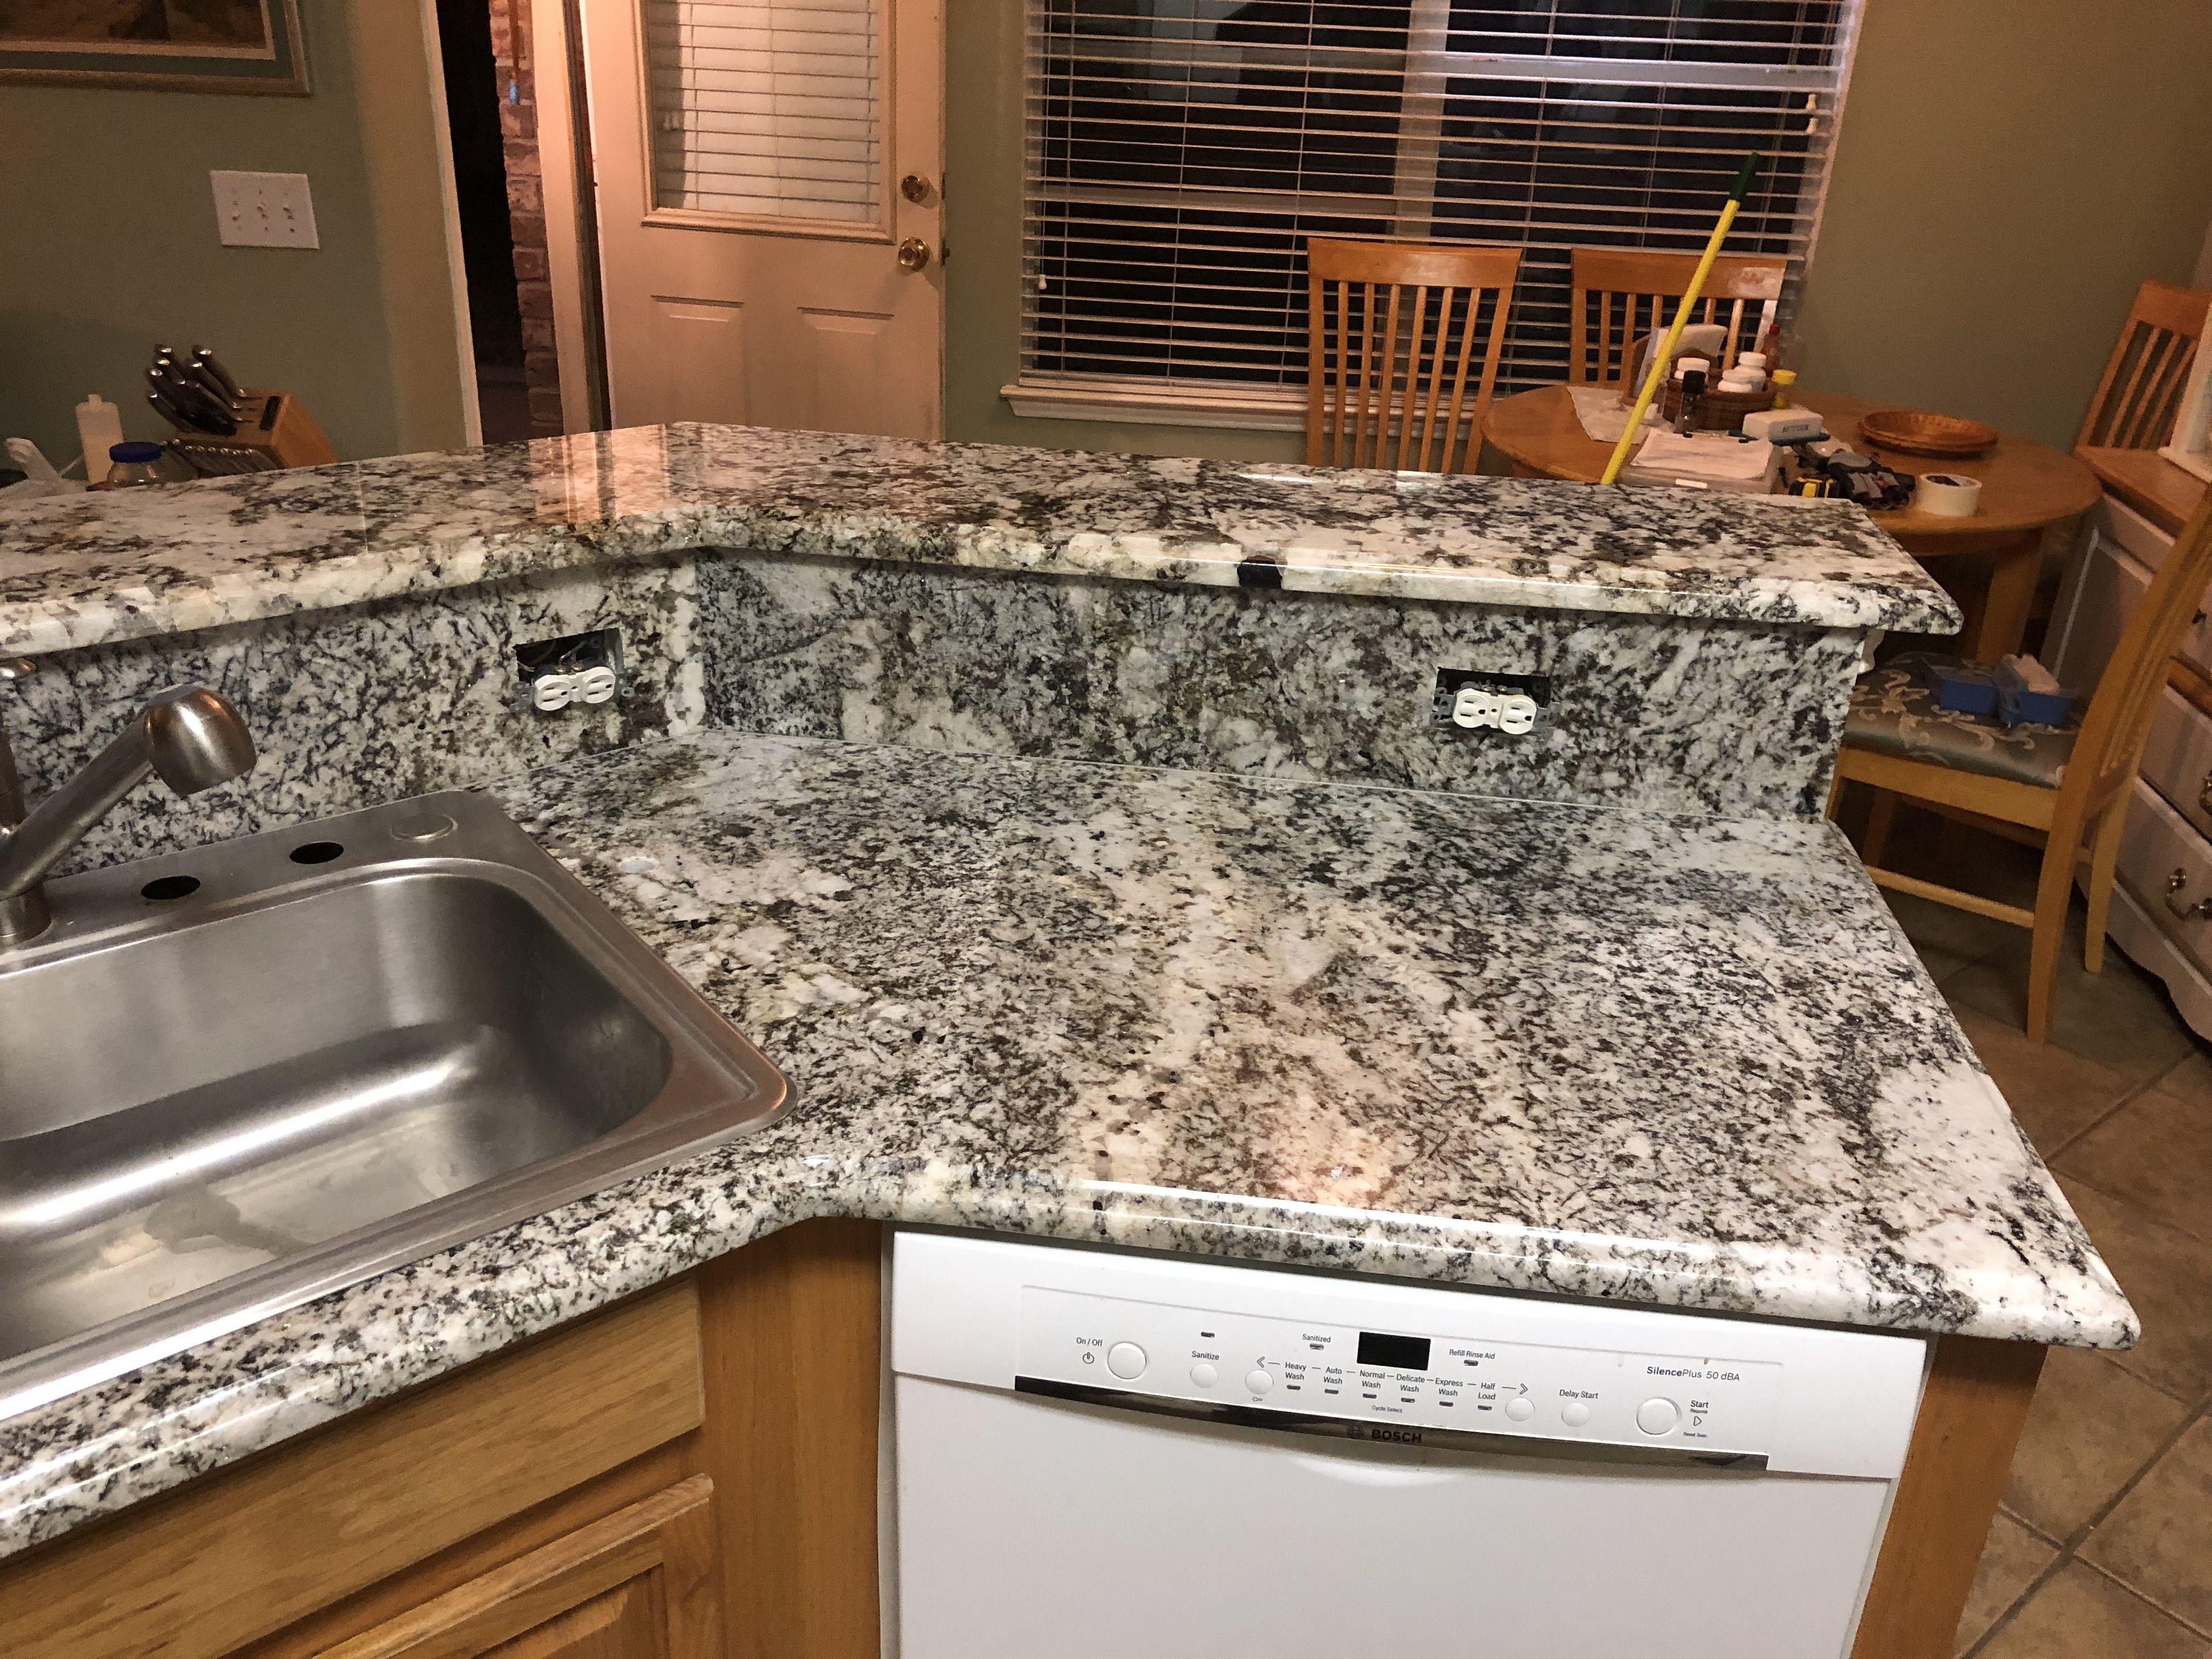 2 Cm Waterfall Granite By Sensa Granite Stone Countertops Granite Granite Countertops